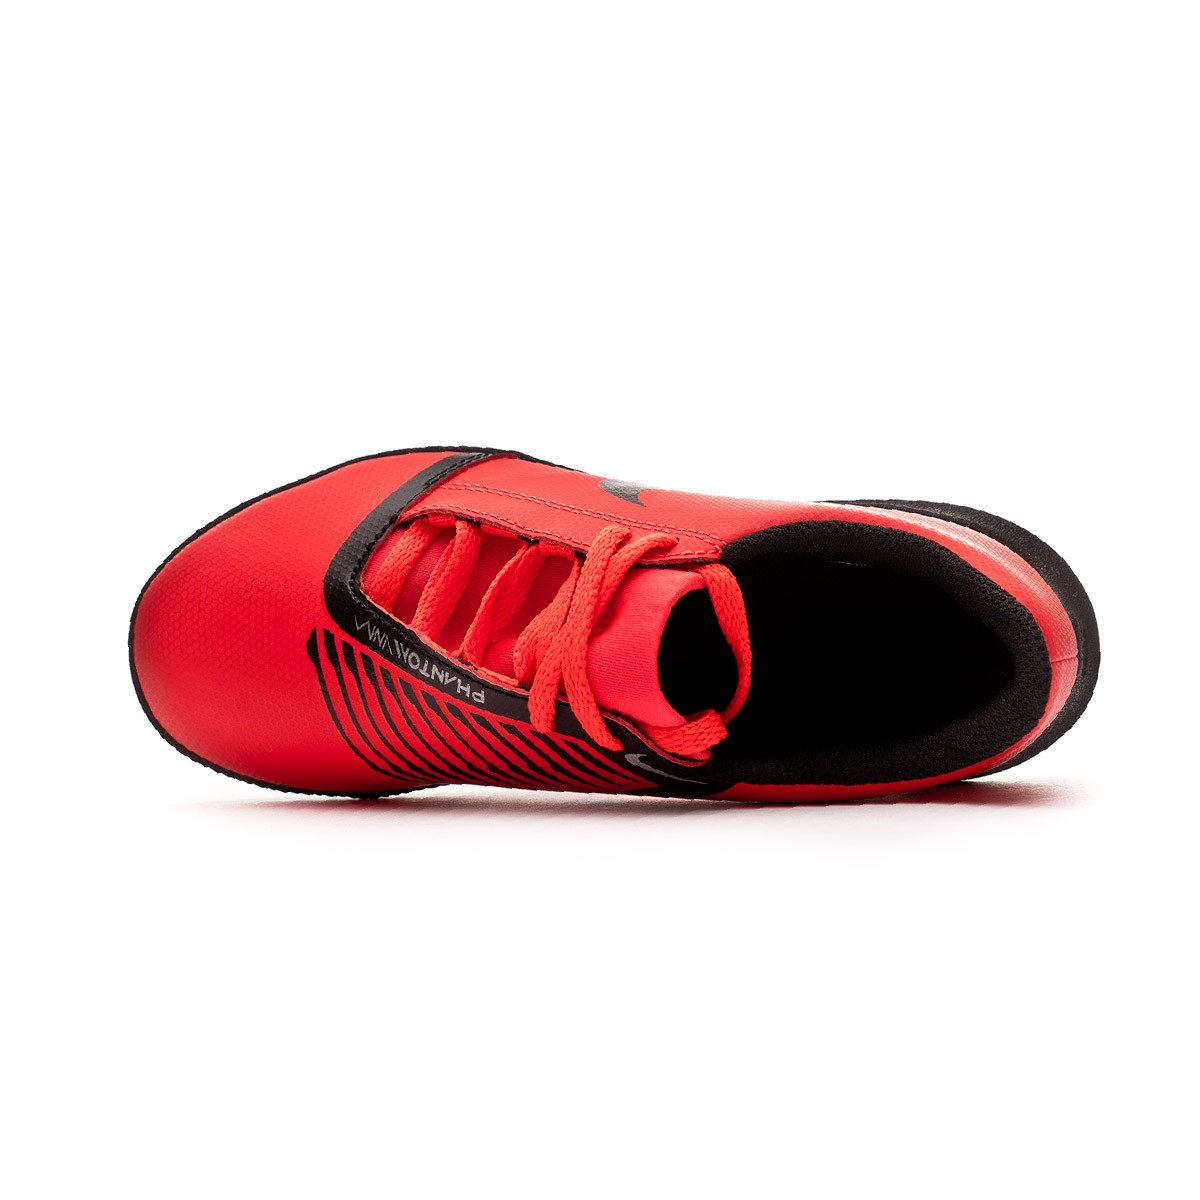 39df075c122a4 Tenis Nike Phantom Venom Club IC Niño Bright crimson-Black - Tienda de fútbol  Fútbol Emotion